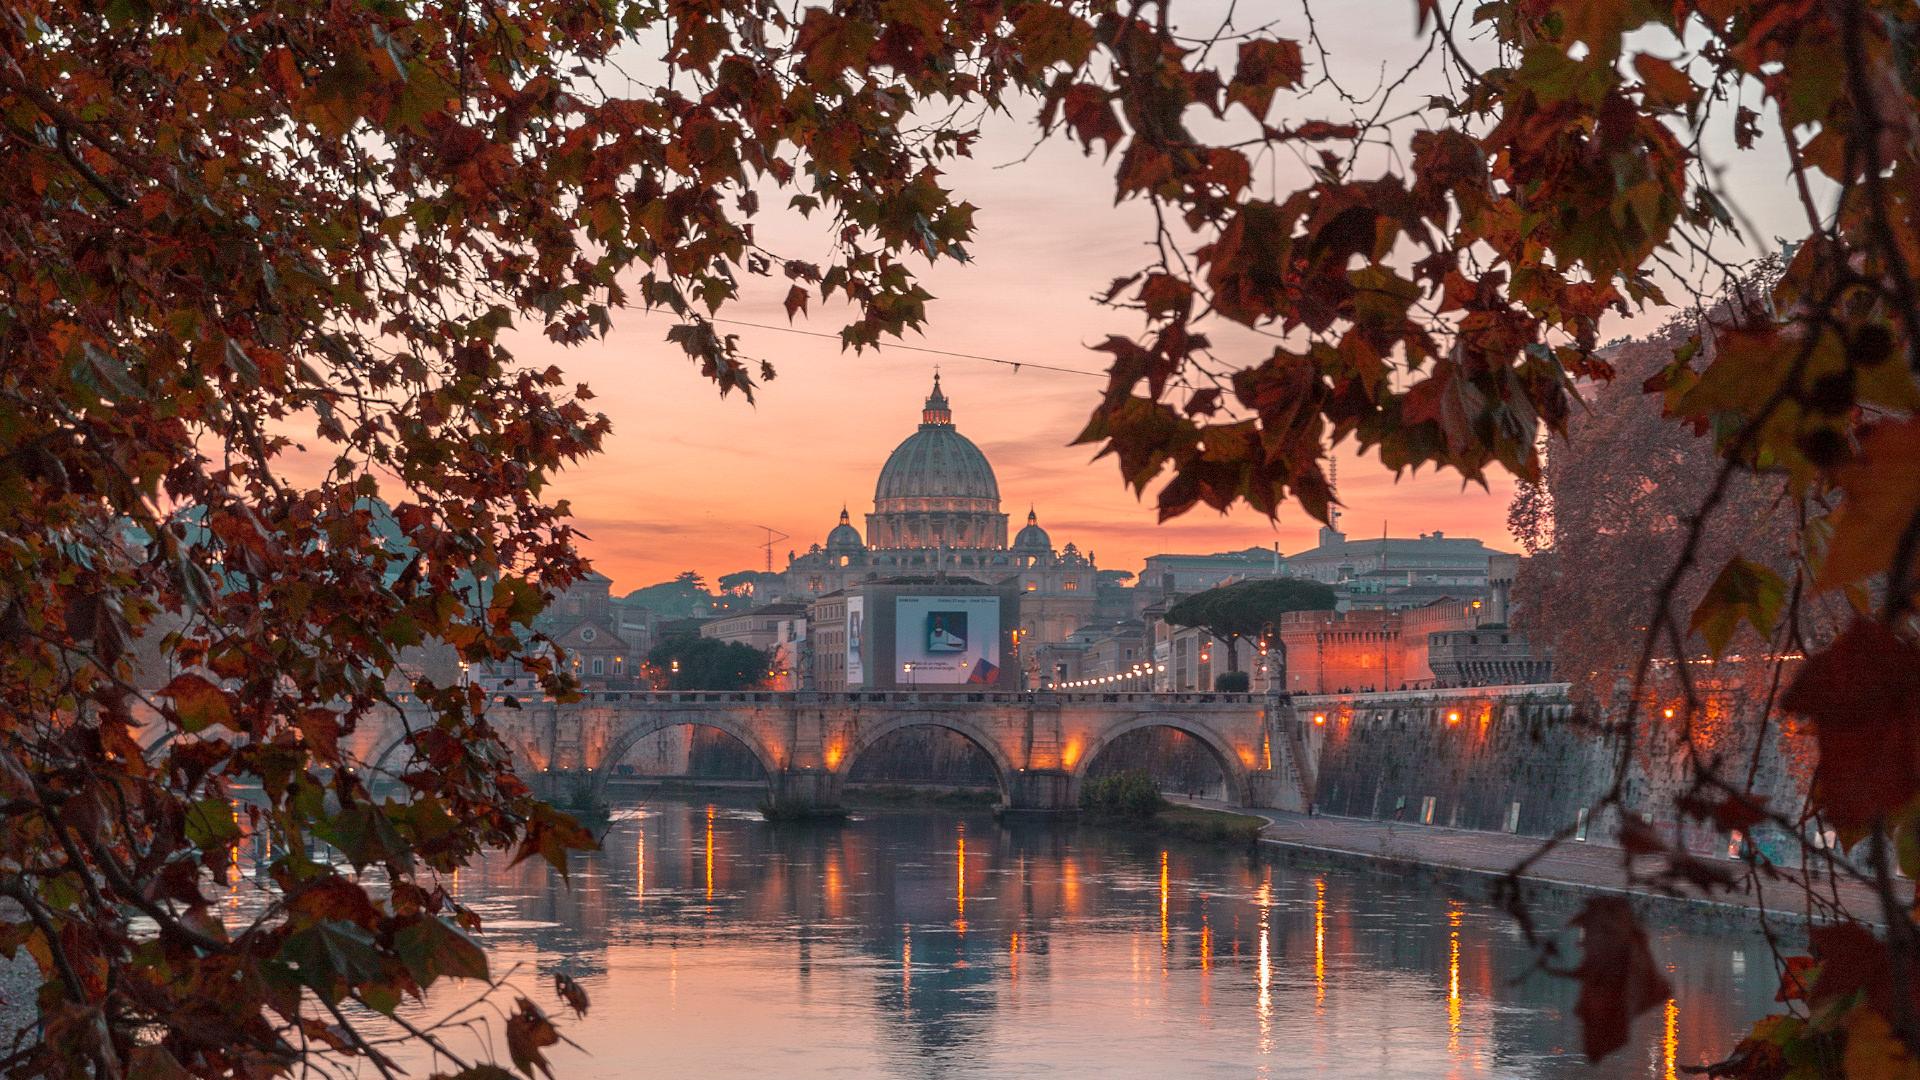 Roma: Hem Aşk Hem Fotoğraf